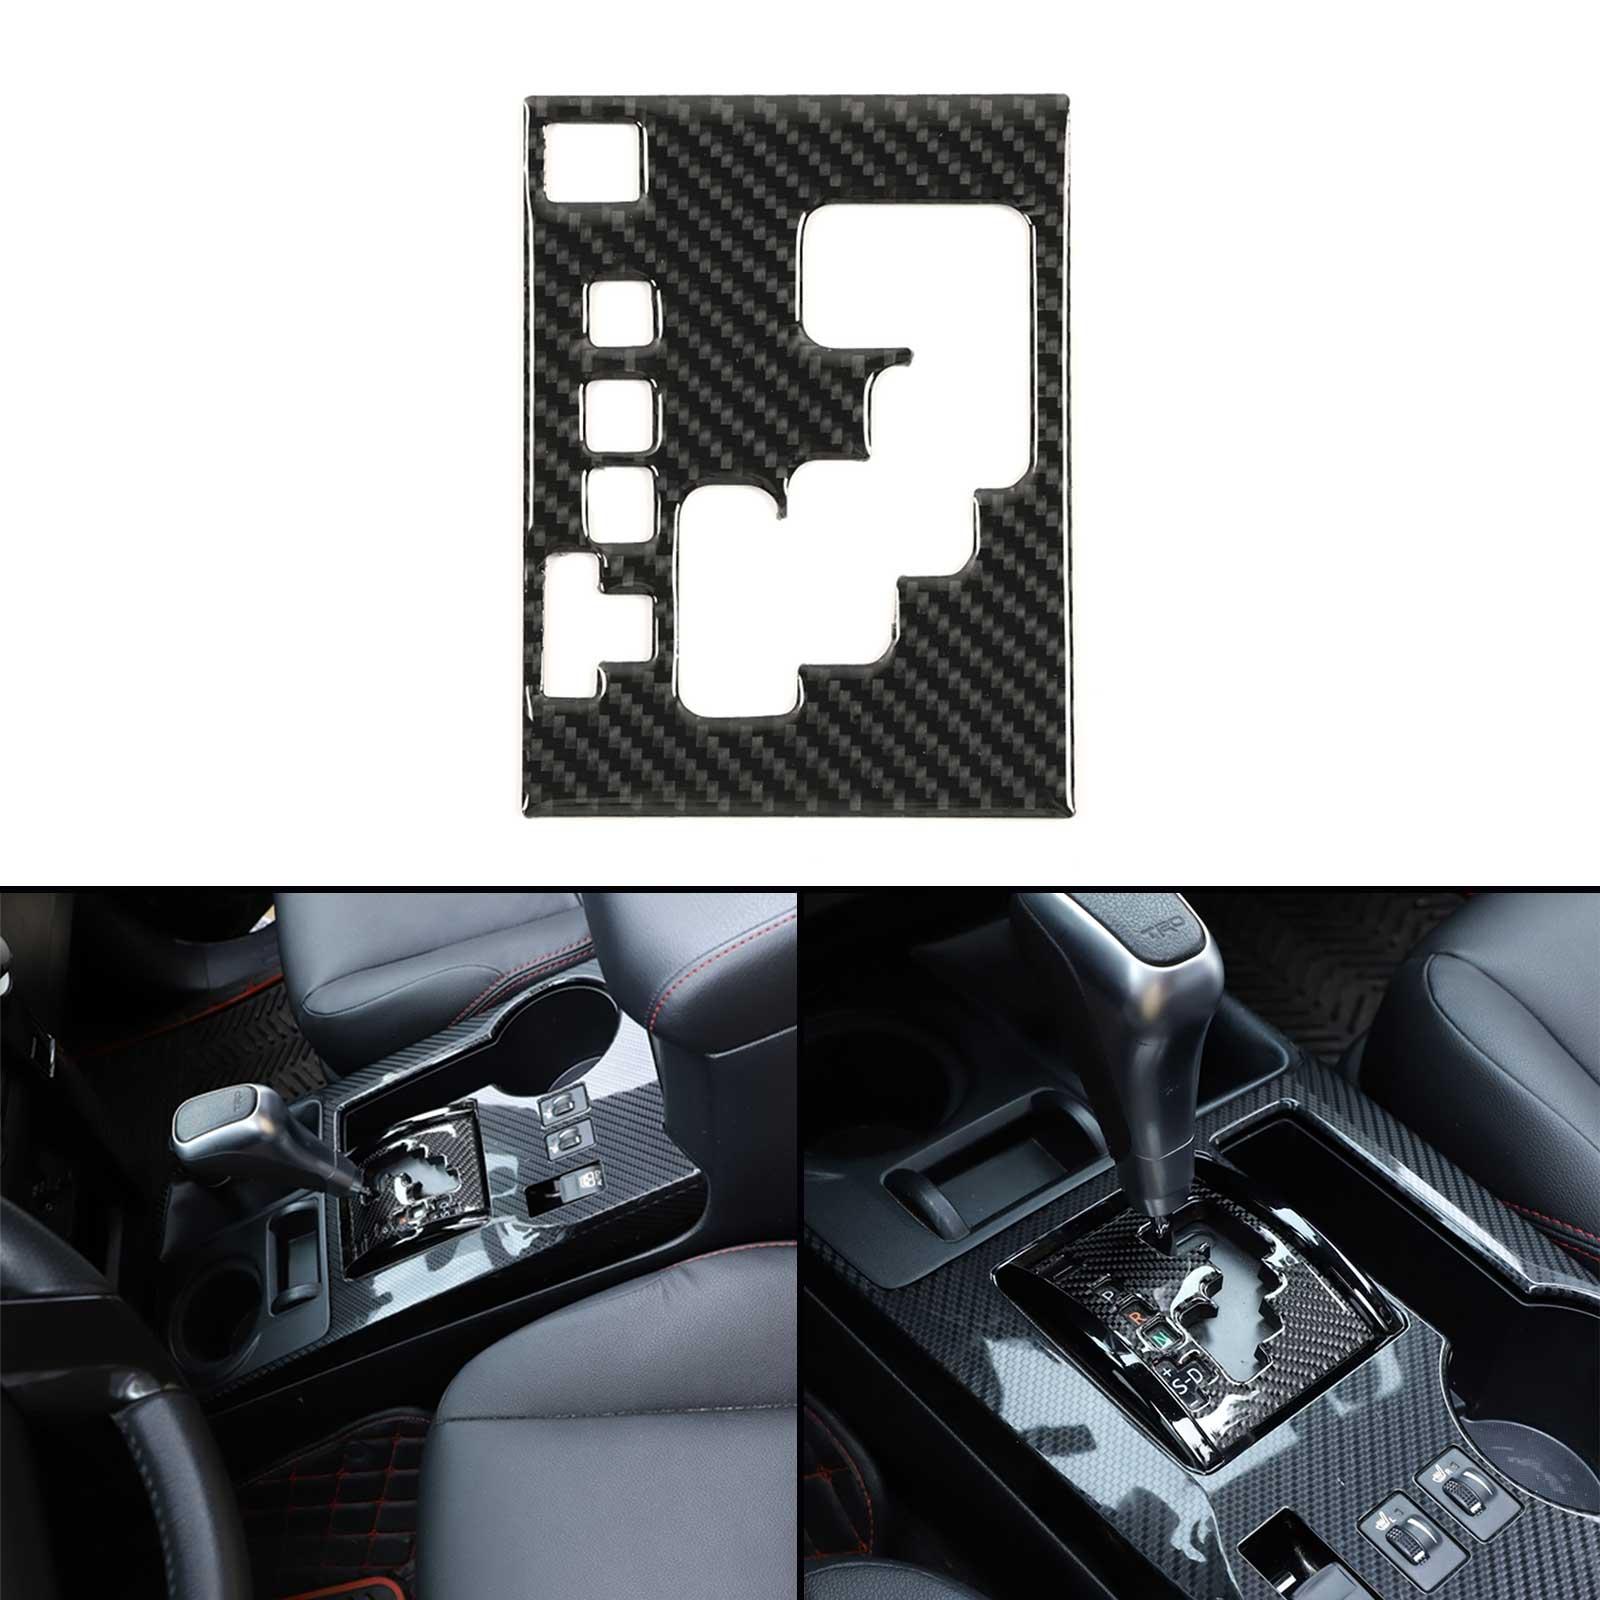 Areyourshop 豐田 4runner 2010-2020 的碳纖維變速箱裝飾蓋配件